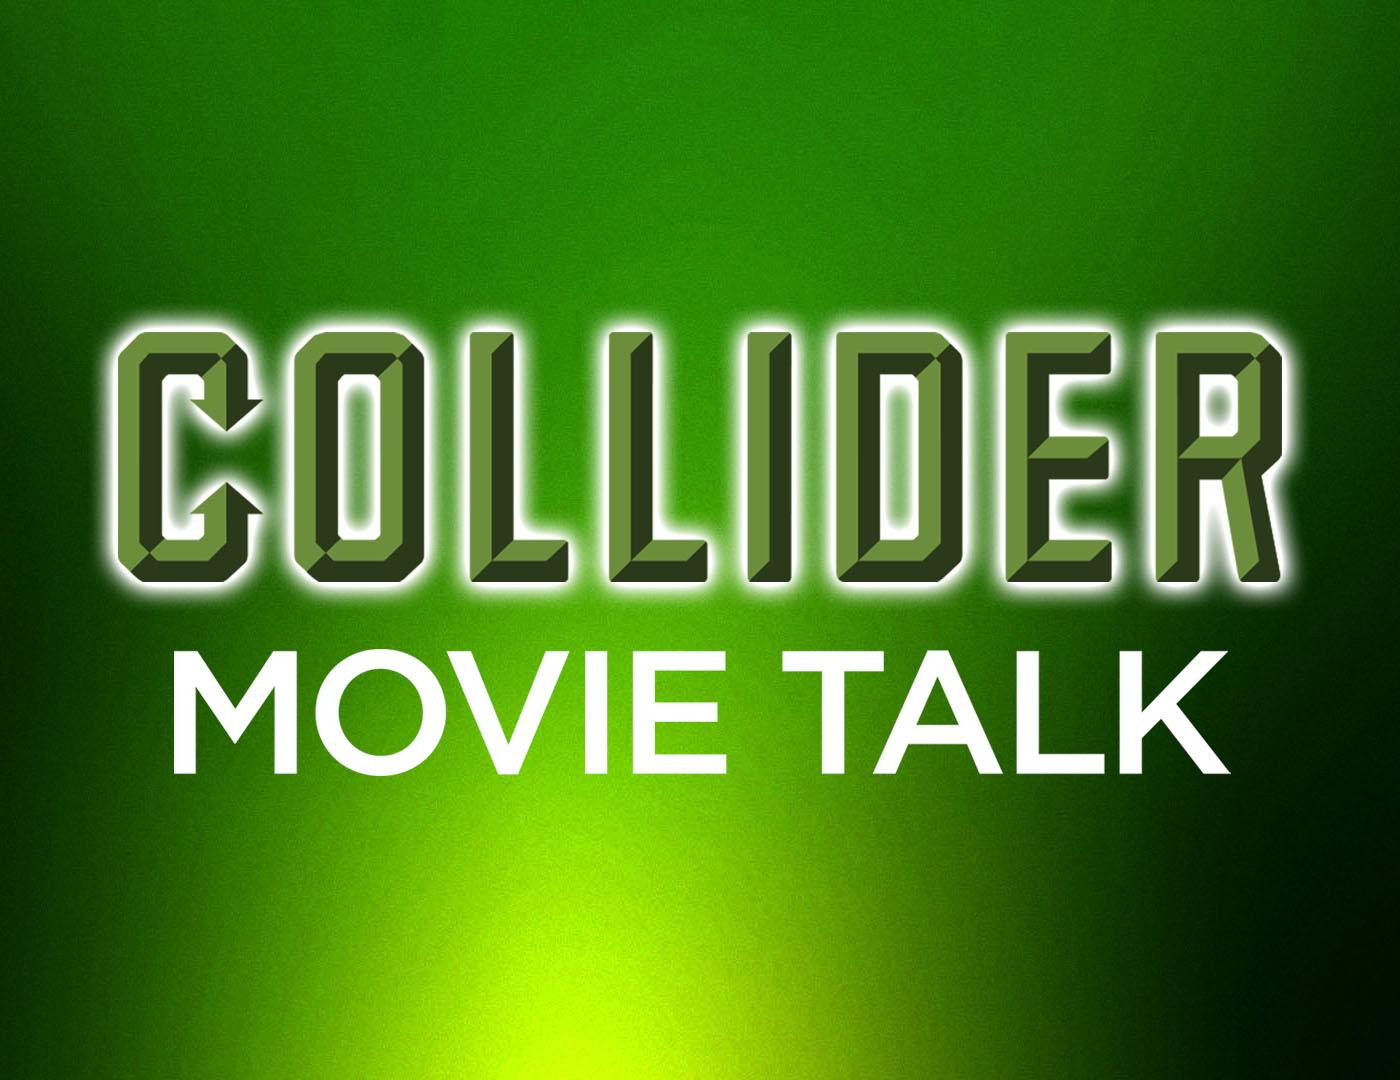 Collider Movie Talk - Sony Pictures Chairman Talks Spider-Man, Marvel Relationship